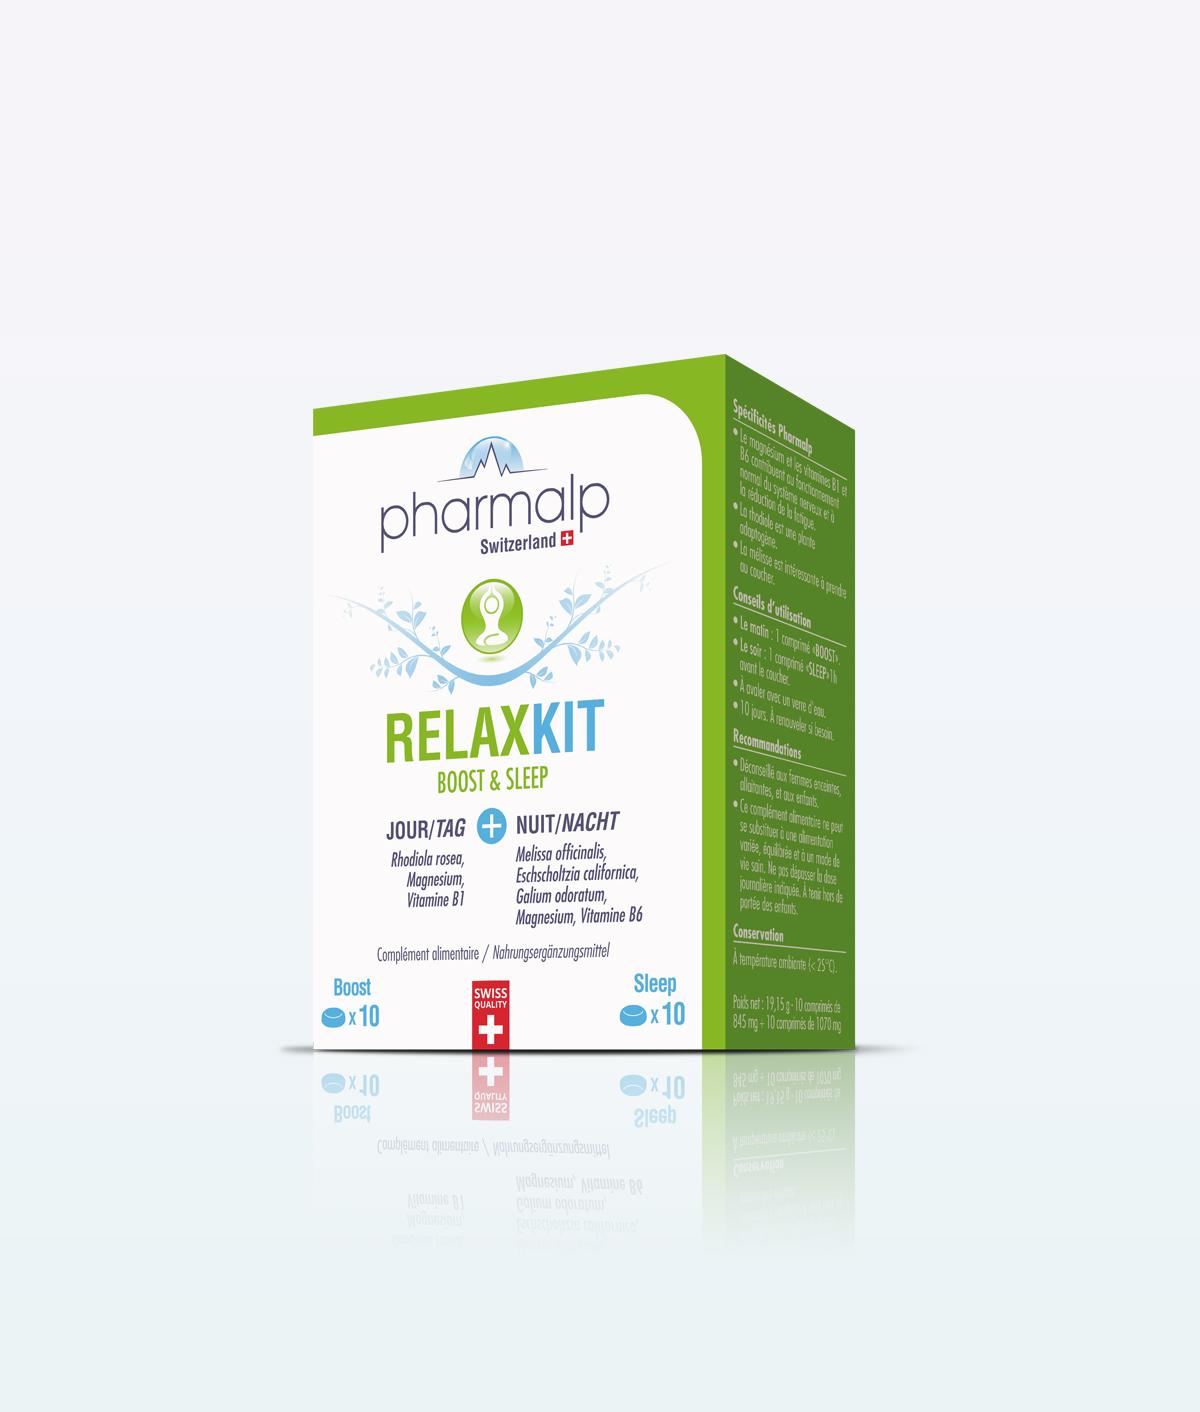 pharmalo-relaxkit-supplements